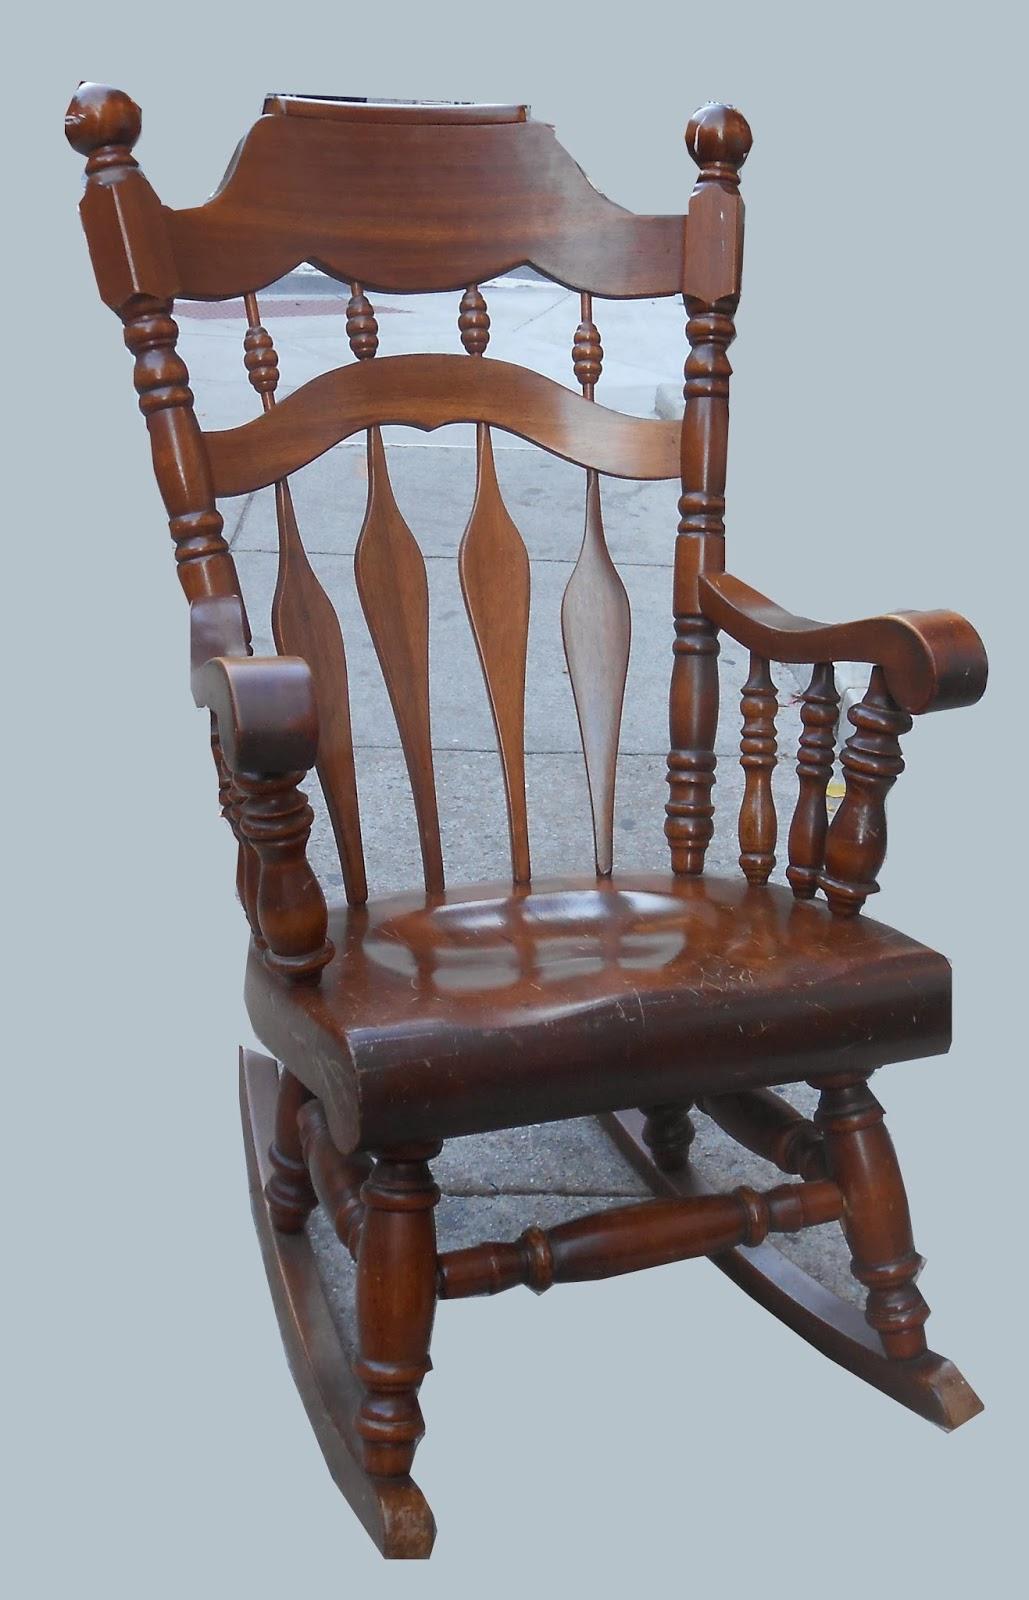 Uhuru Furniture & Collectibles: Heavy Duty Walnut Rocker SOLD